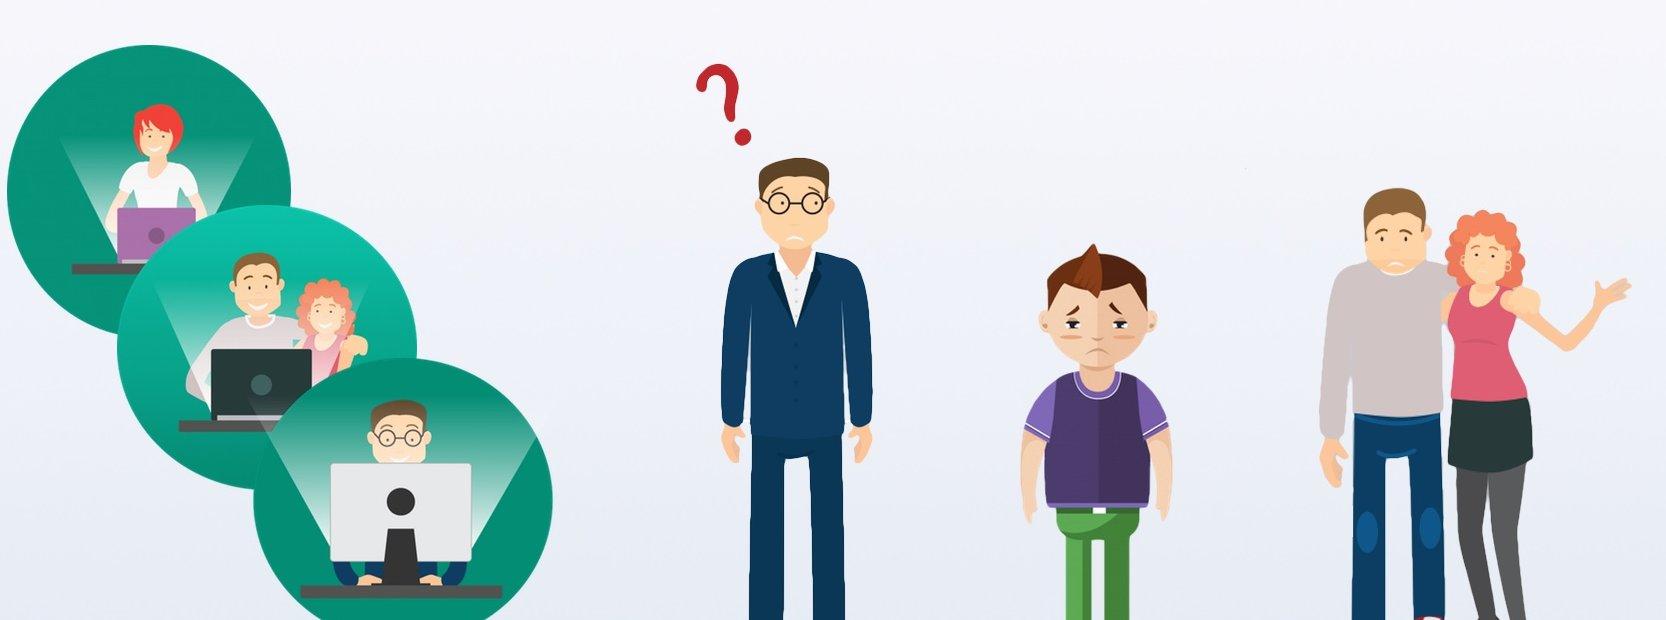 Curso TDAH: Detección e intervención en adolescentes